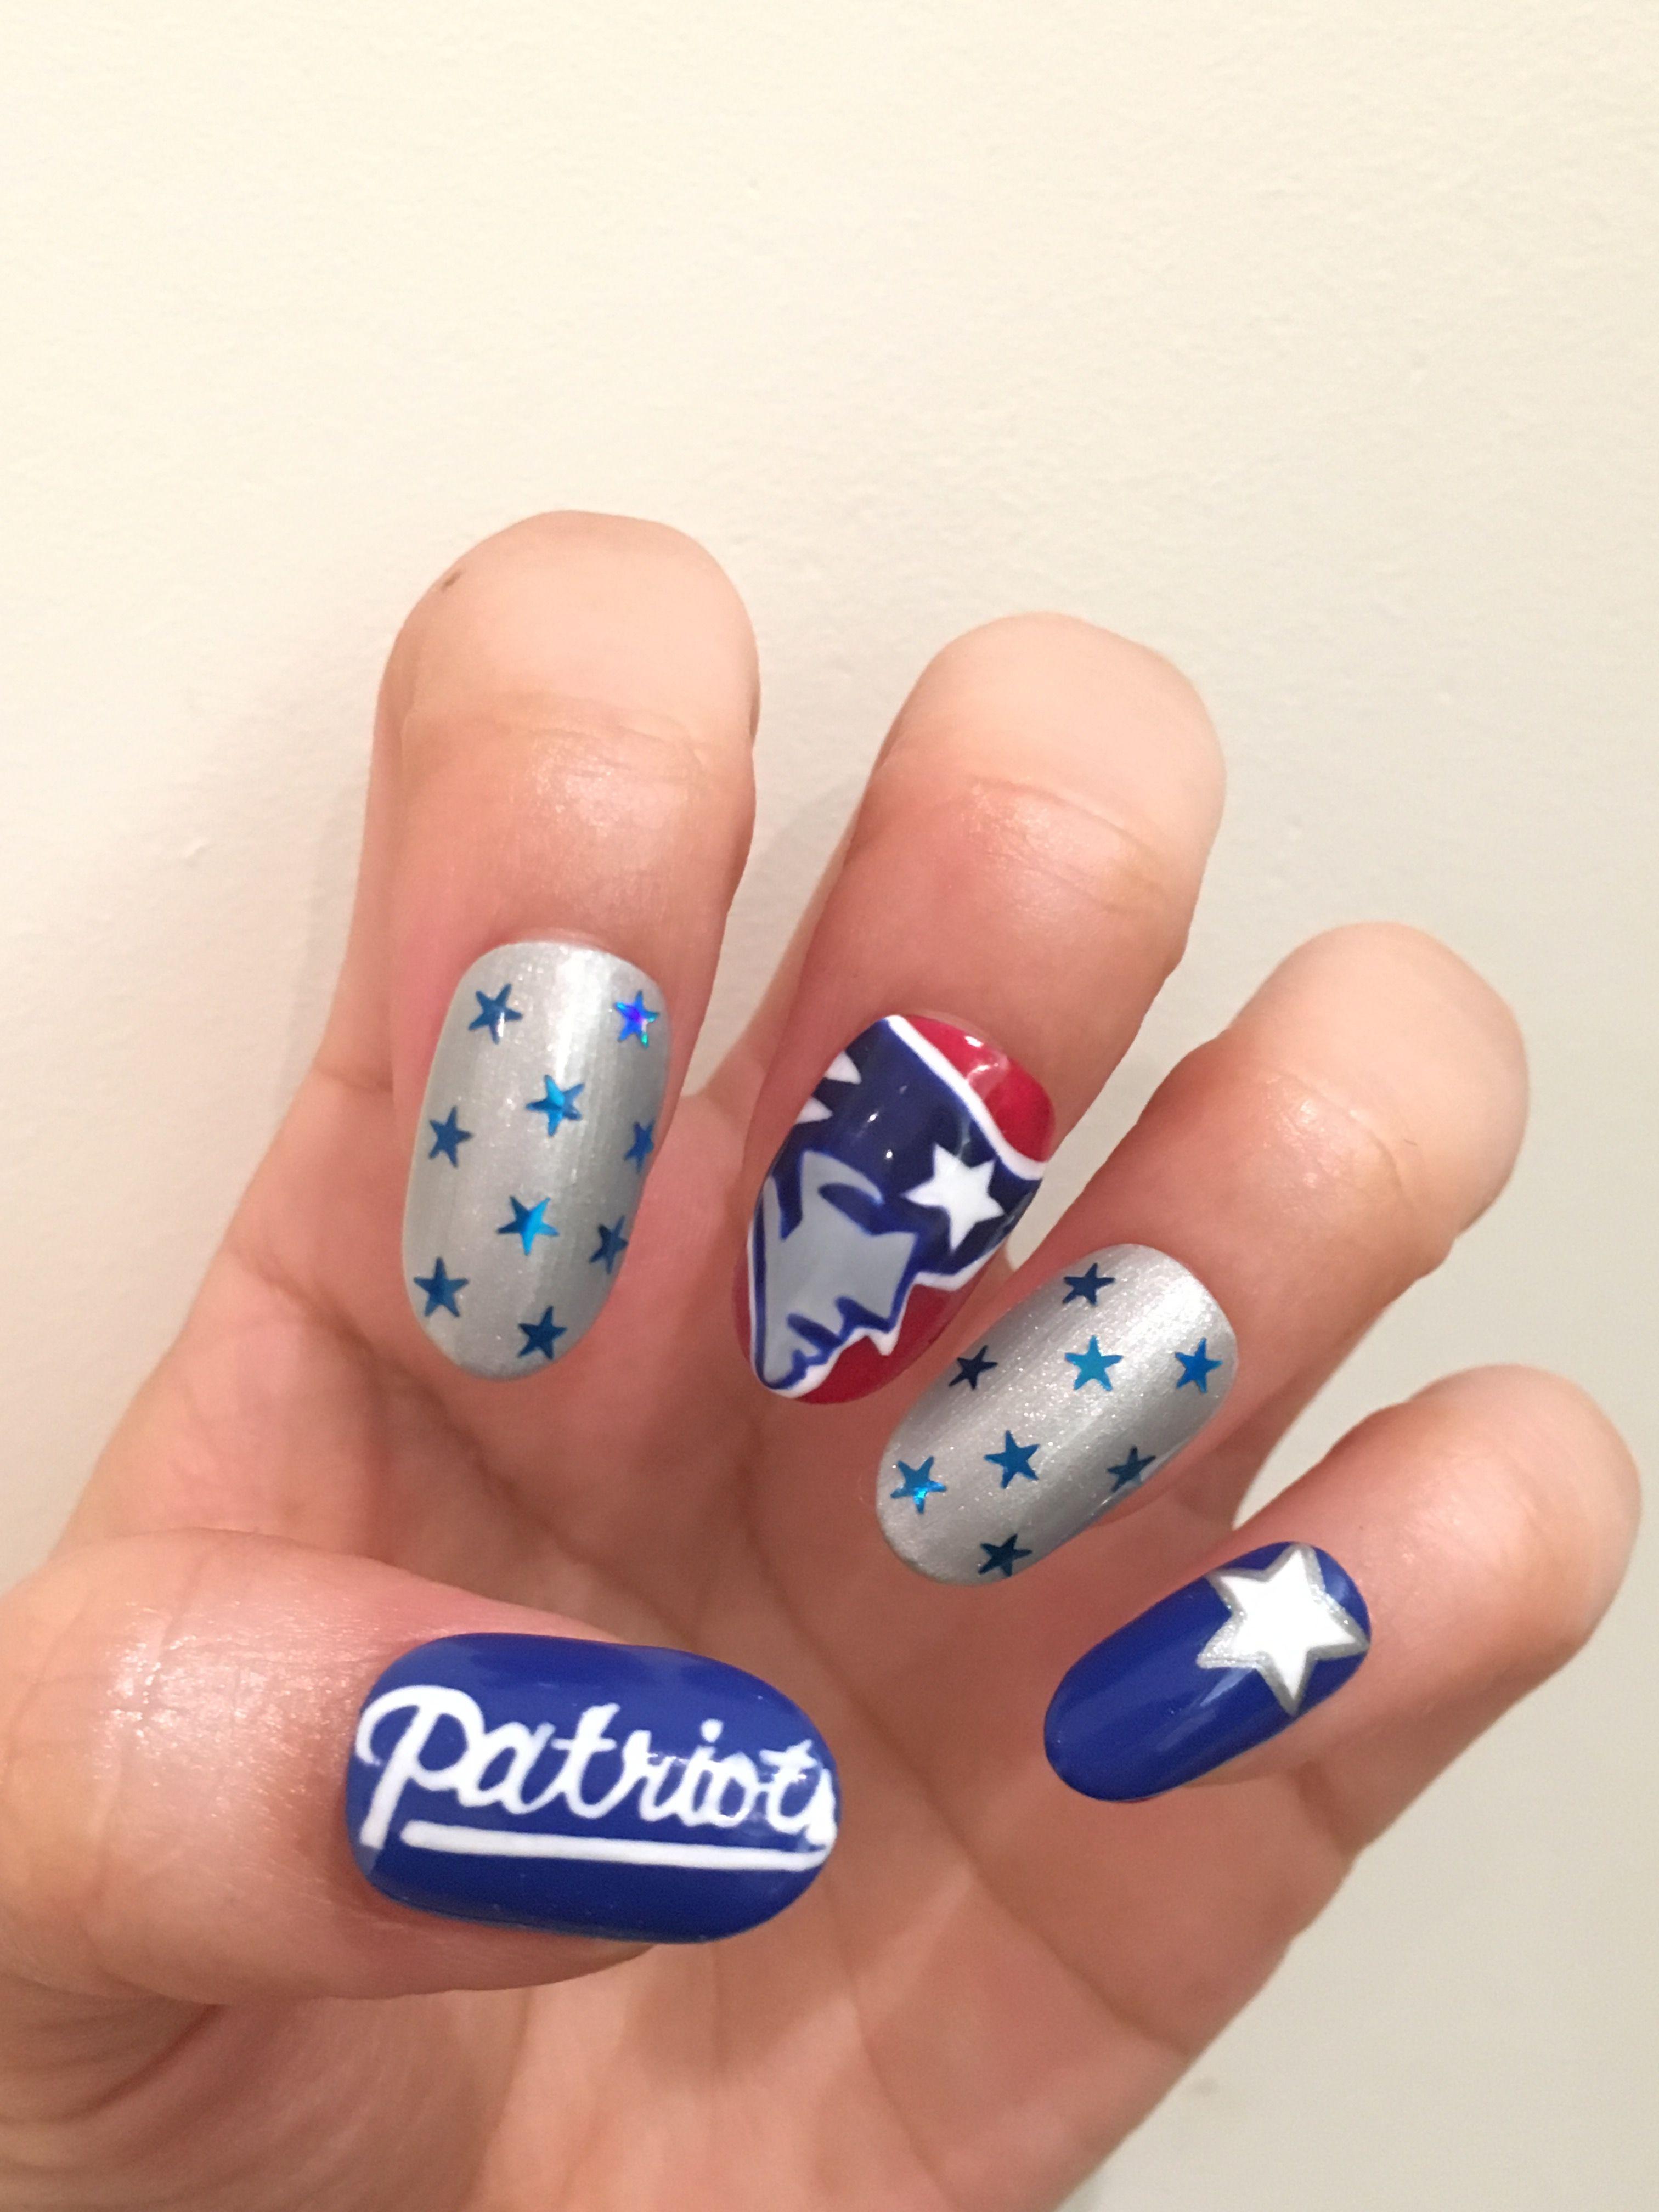 New England Patriots Nail Art   Nails   Pinterest   England patriots ...